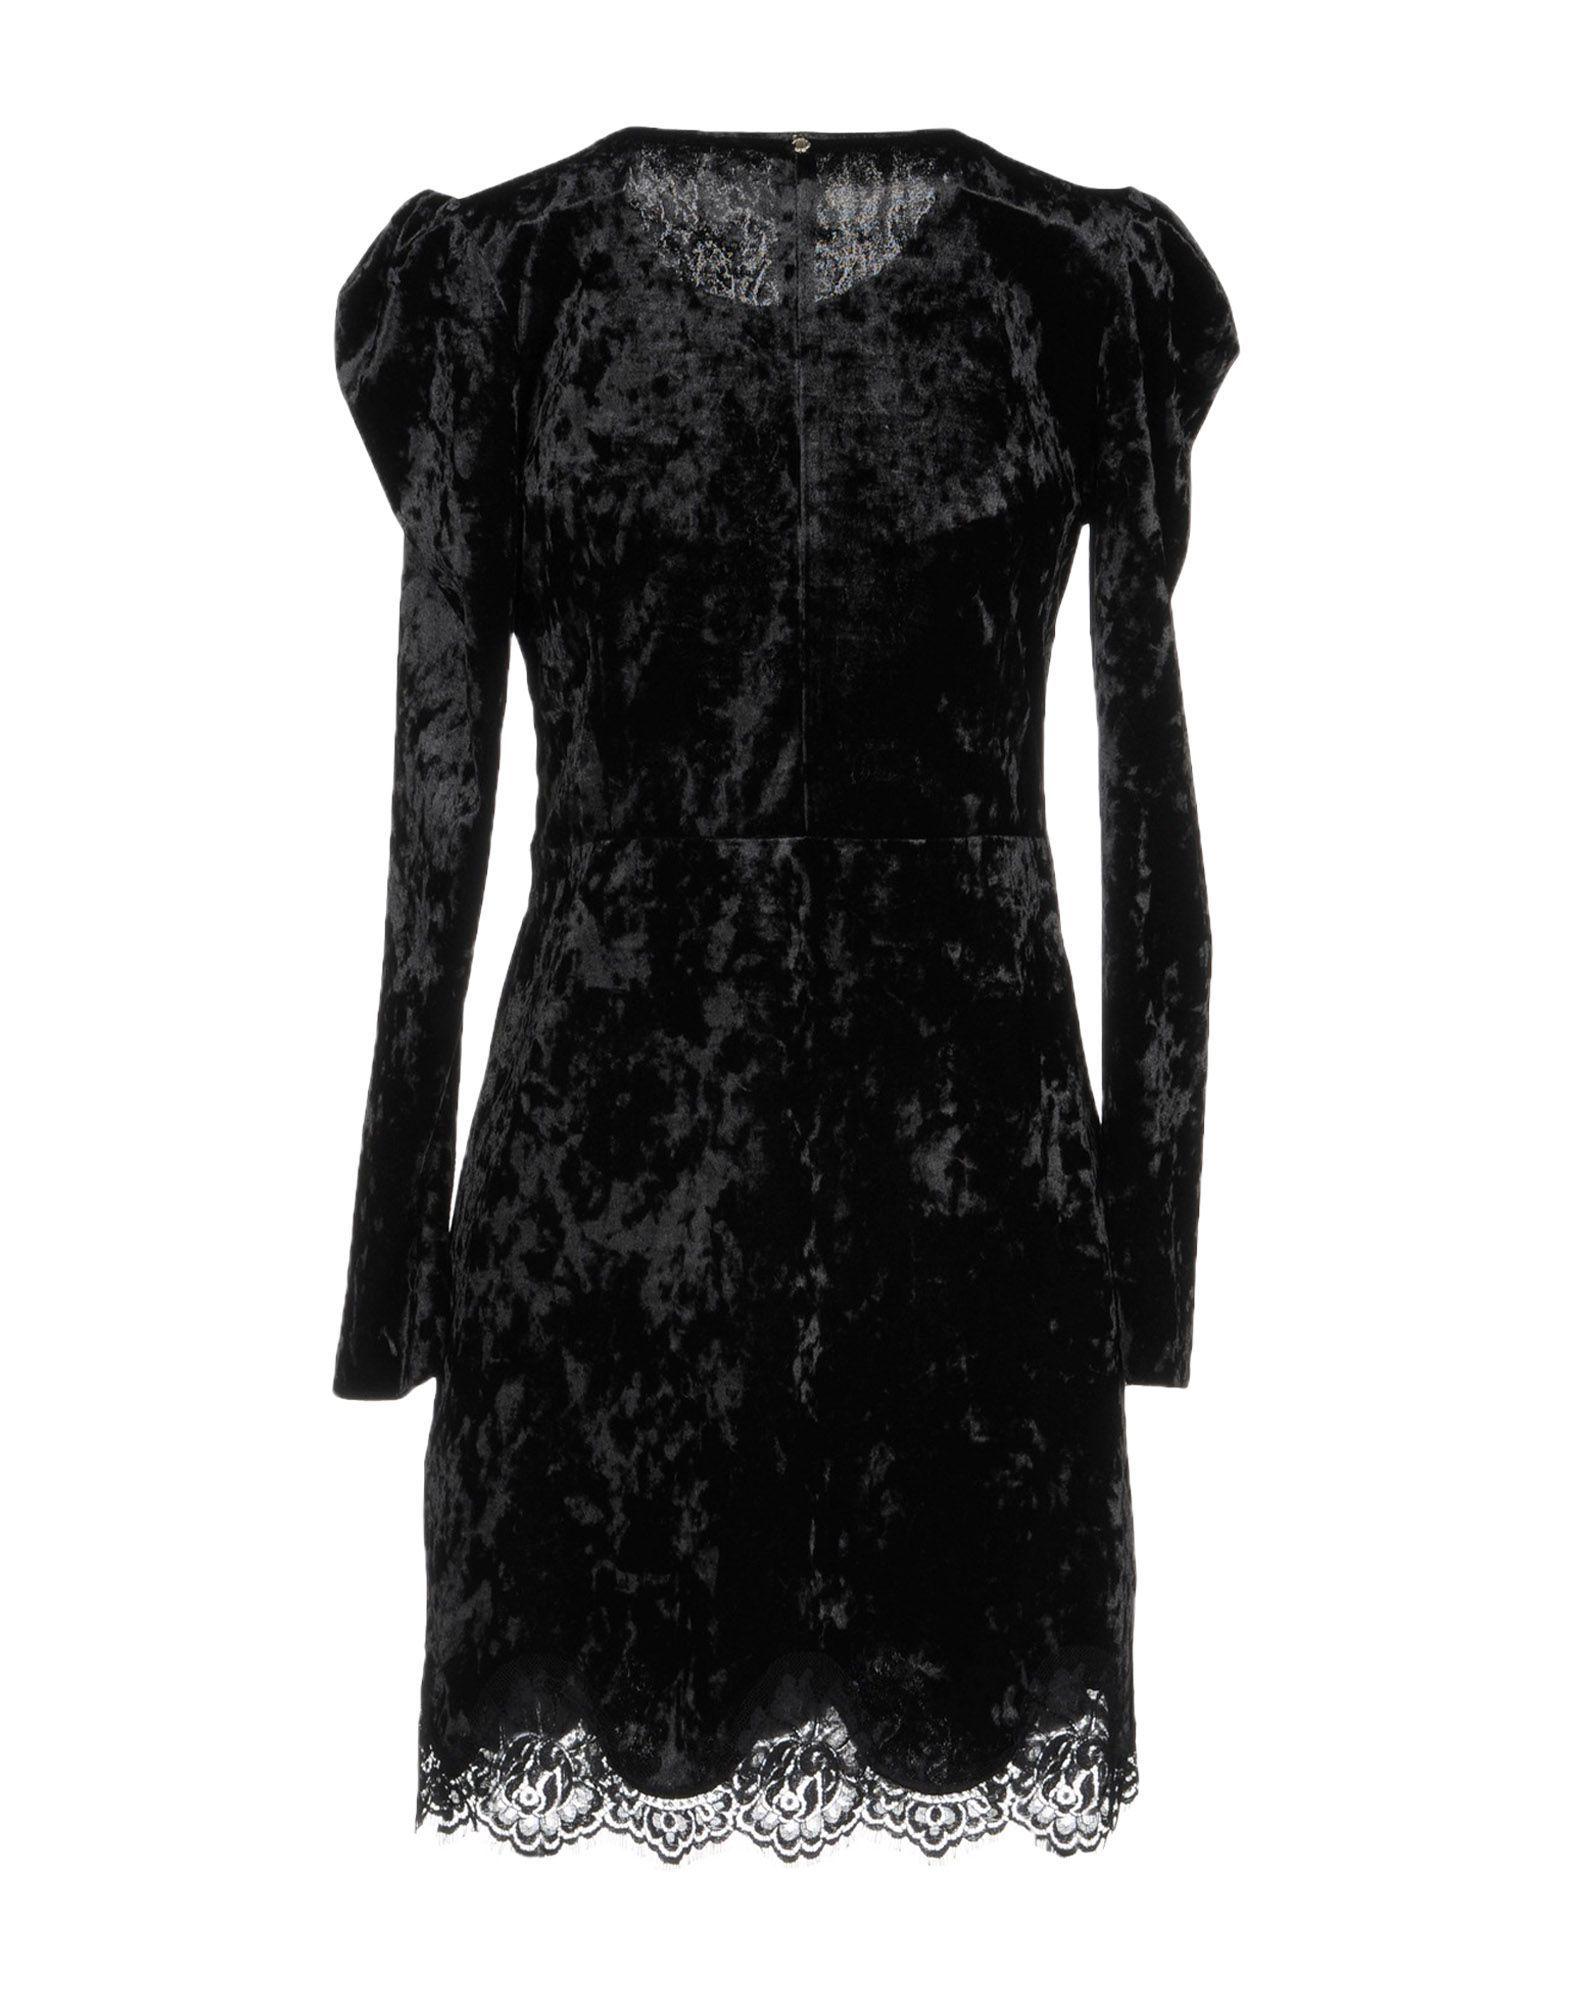 Annarita N Black Chenille And Lace Long Sleeve Dress